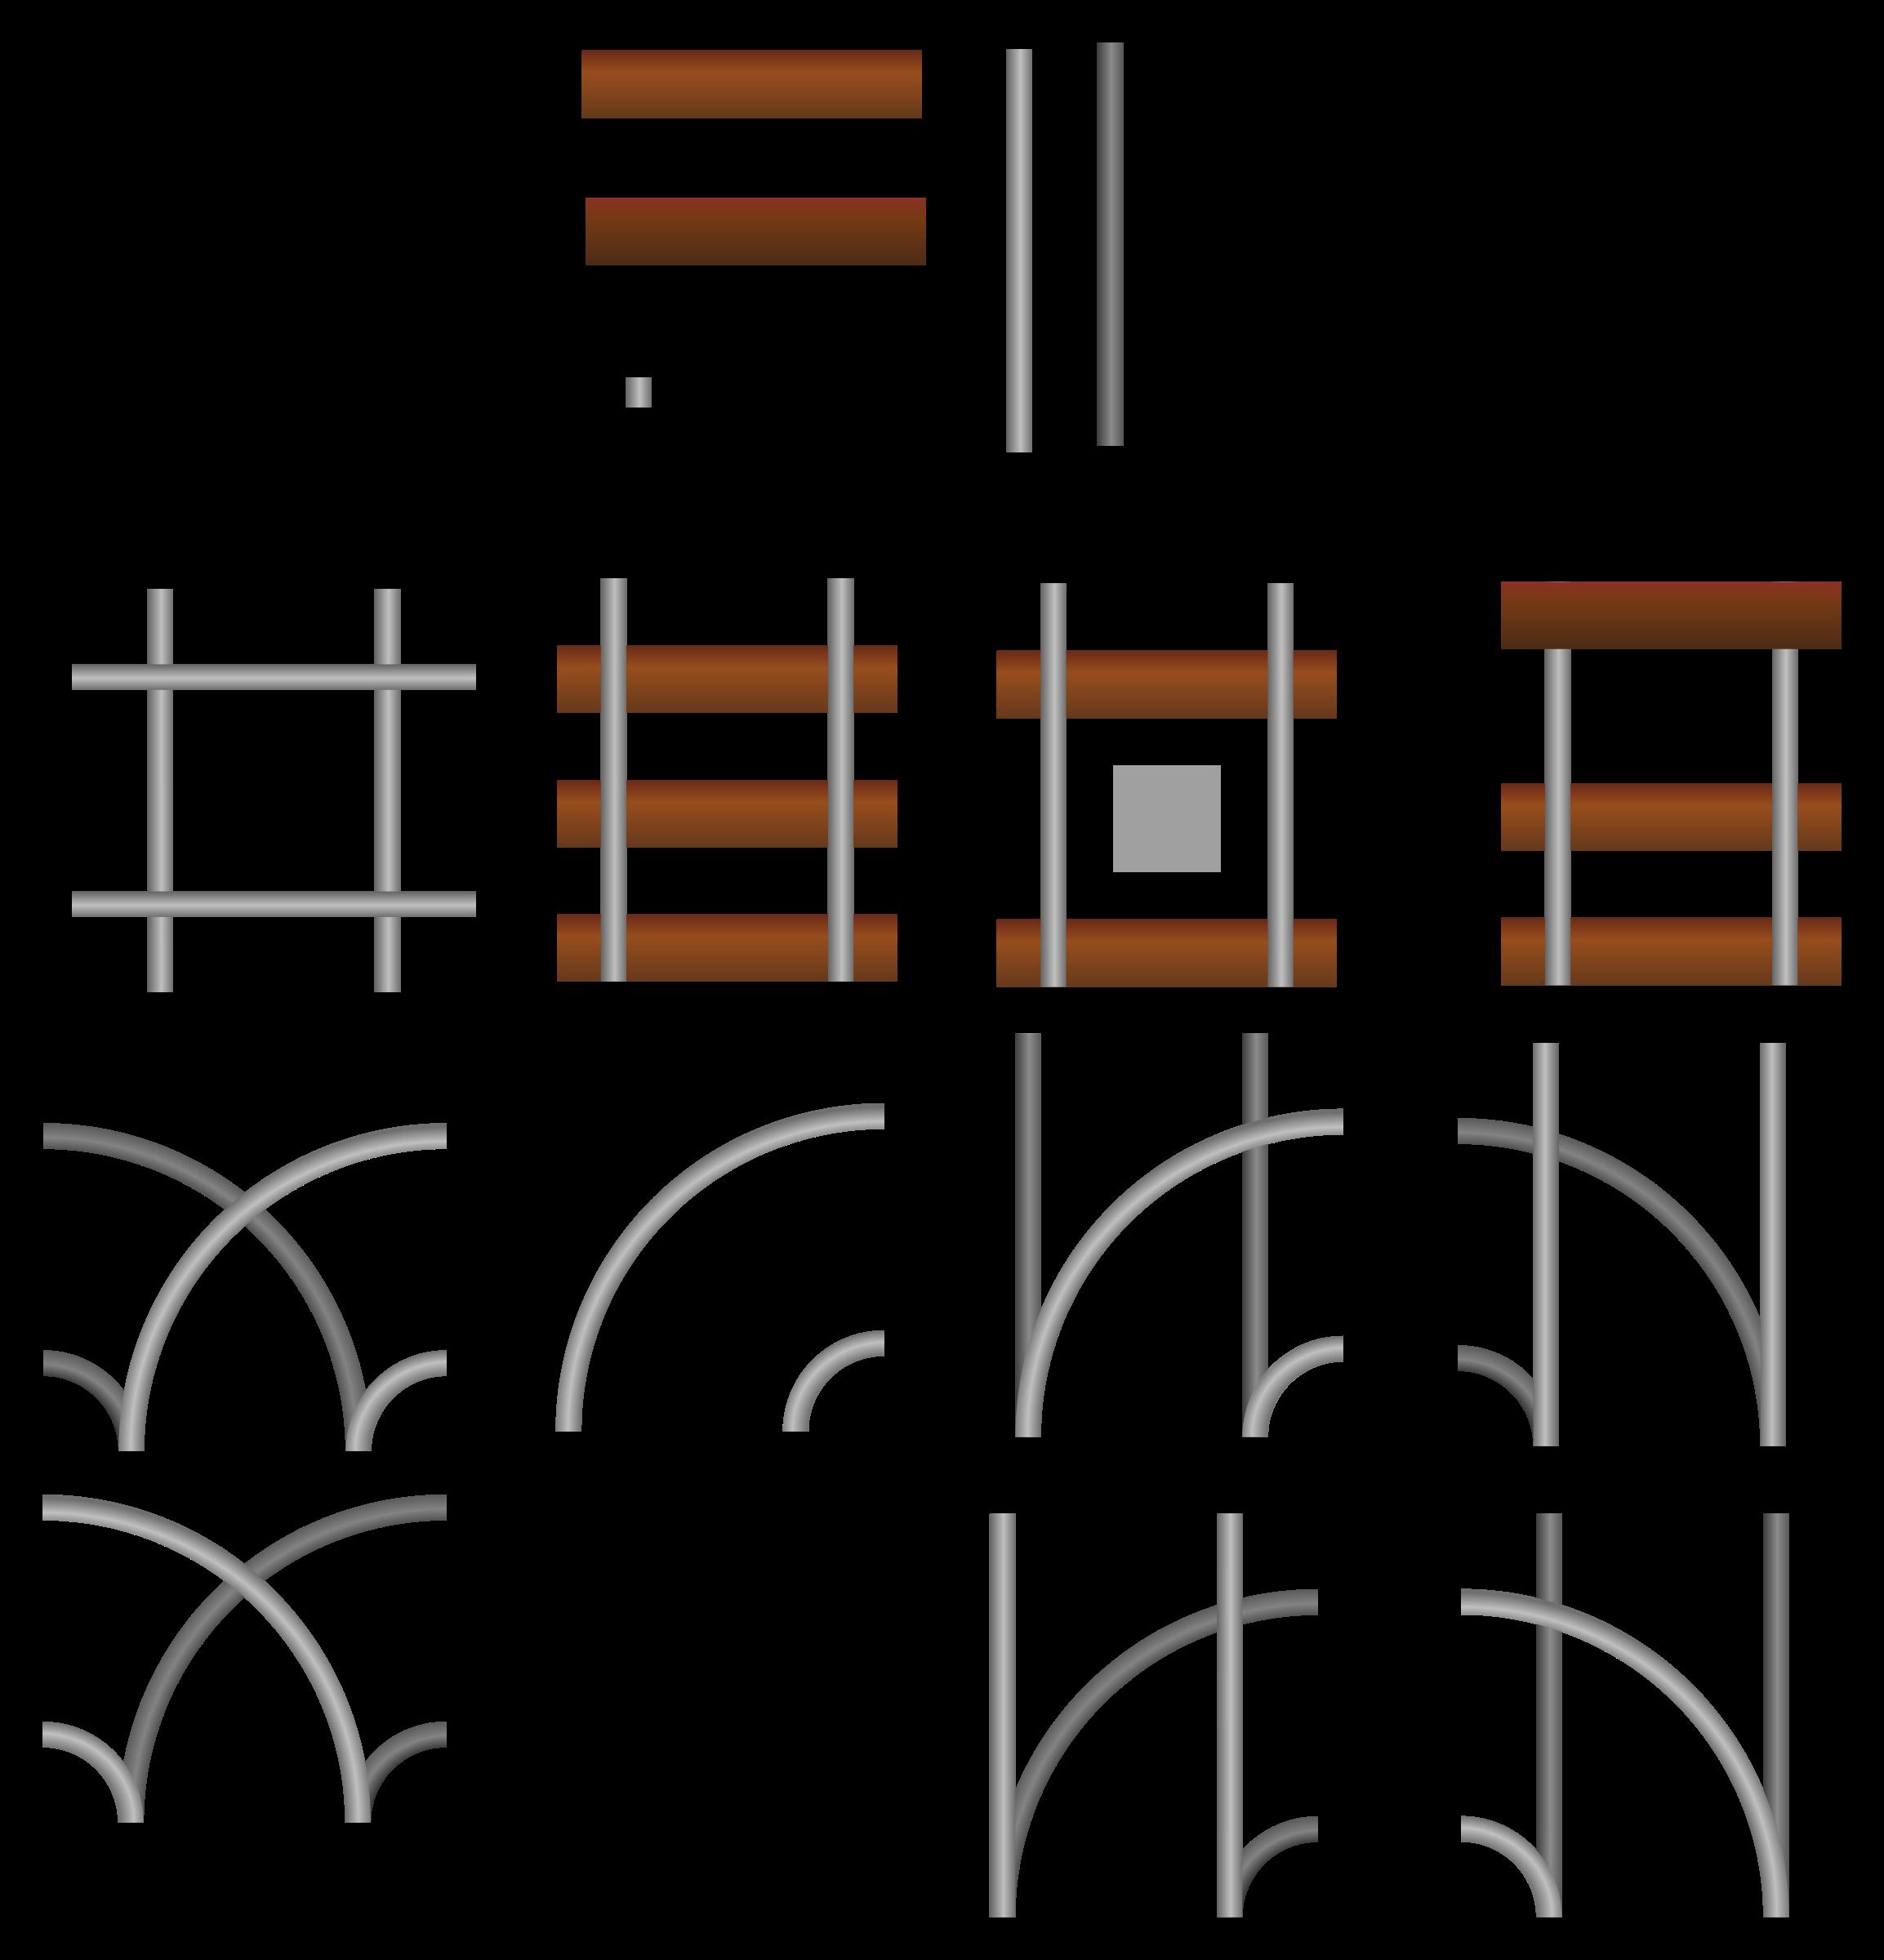 Track clipart railroad. Tiles big image png